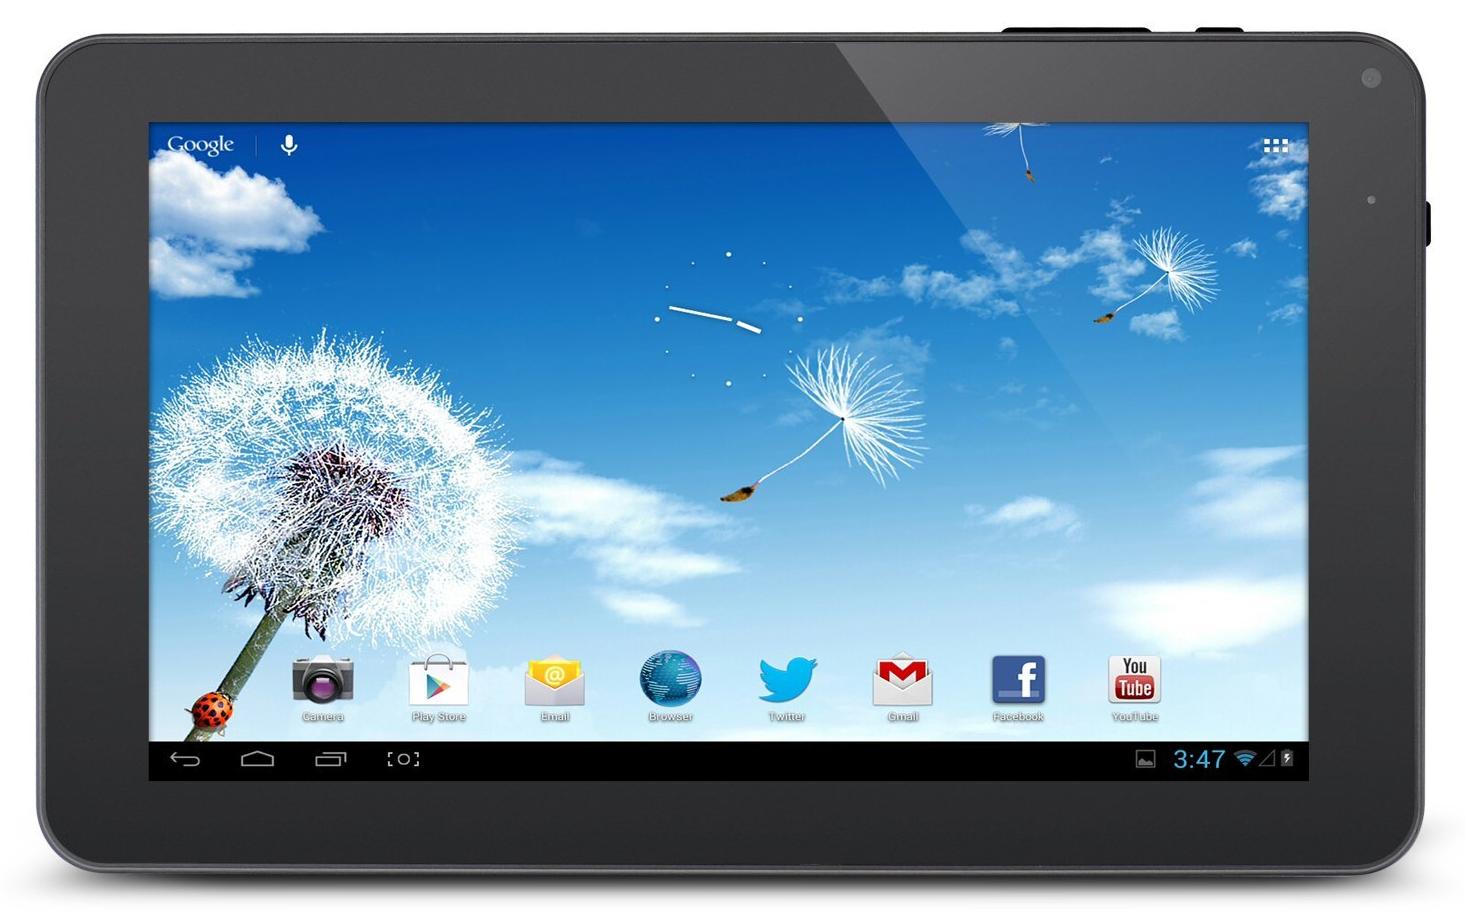 Alldaymall 9 Inch Android 4.4 KitKat Tablet